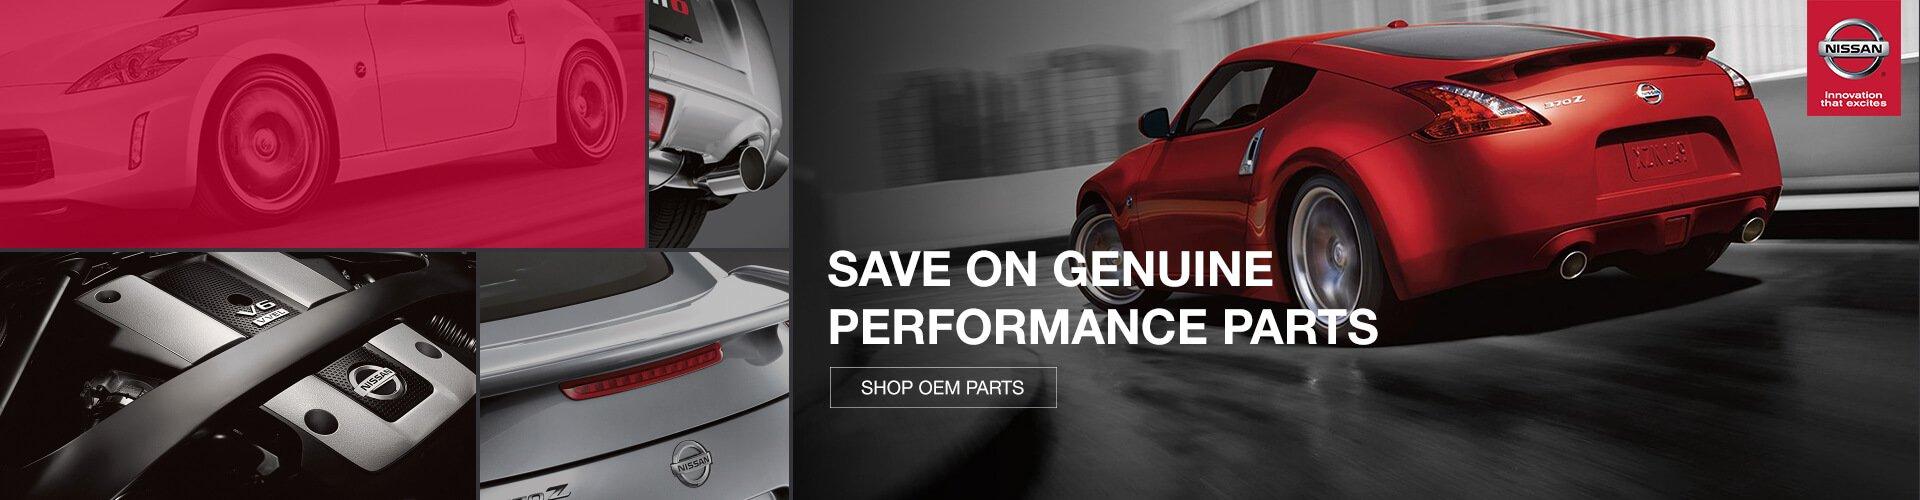 Nissan Performance Parts